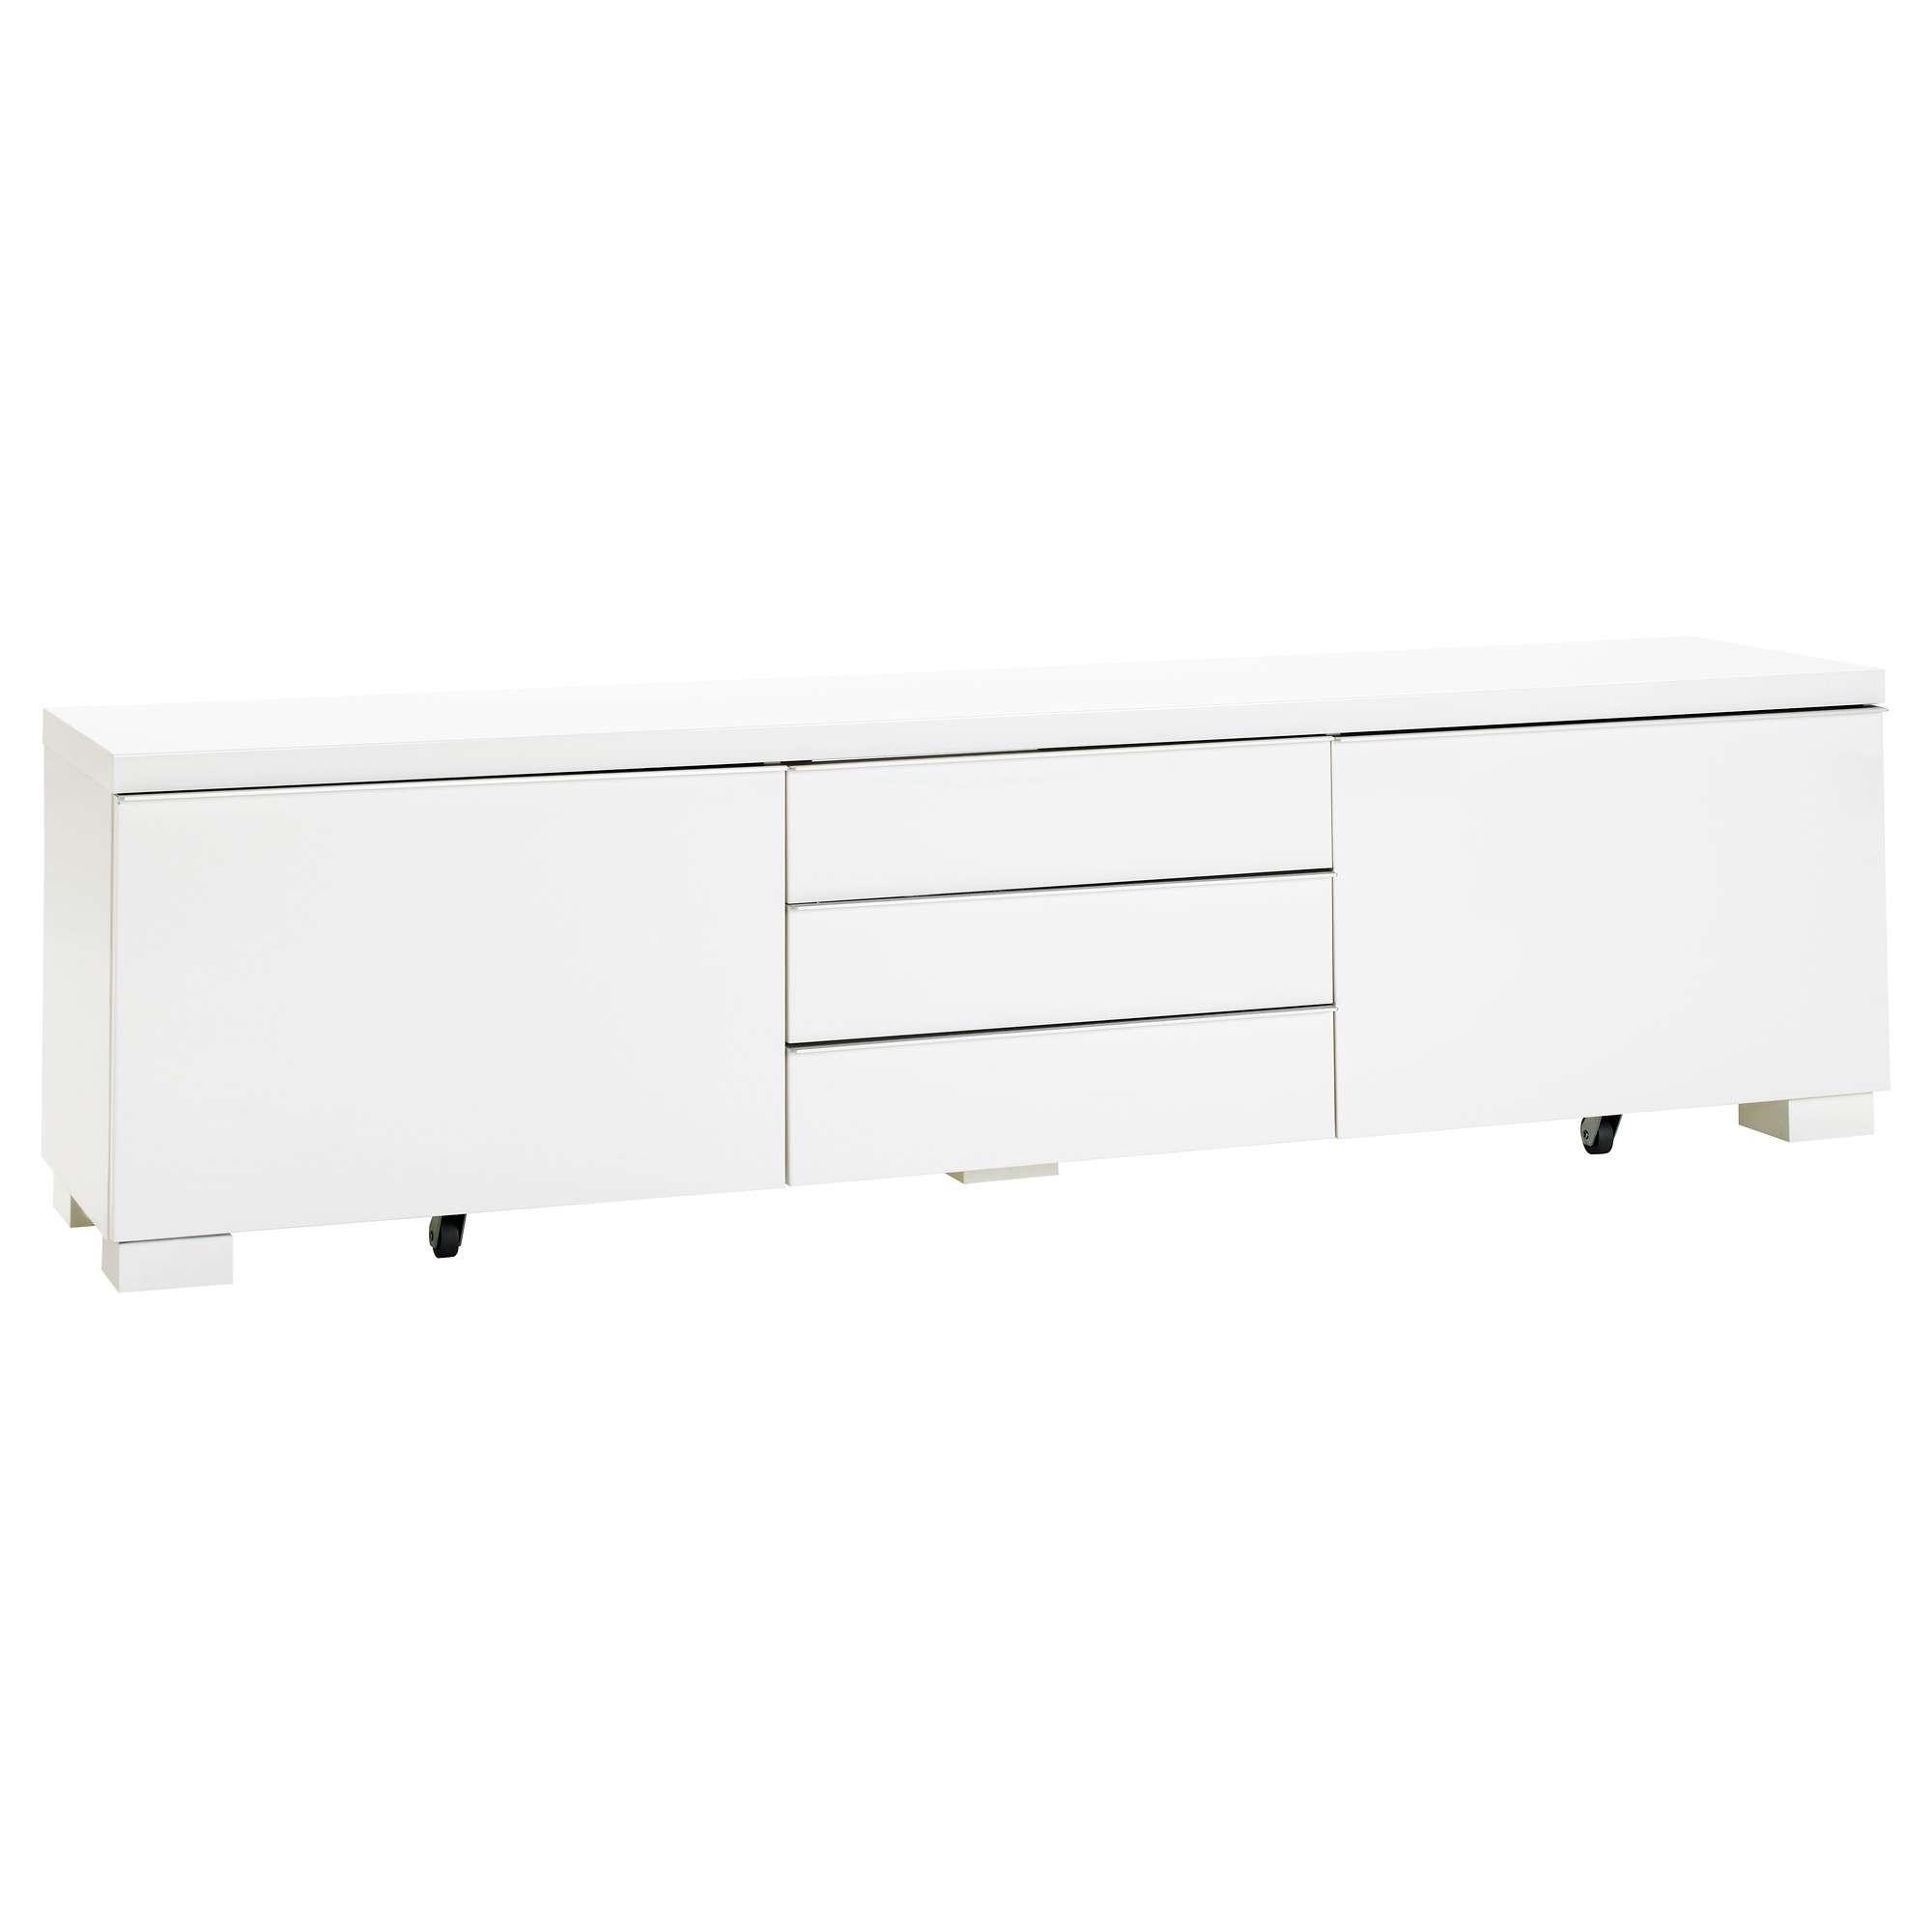 Bestå Burs Tv Bench High Gloss White 180X41 Cm – Ikea Inside White Gloss Ikea Sideboards (View 3 of 20)